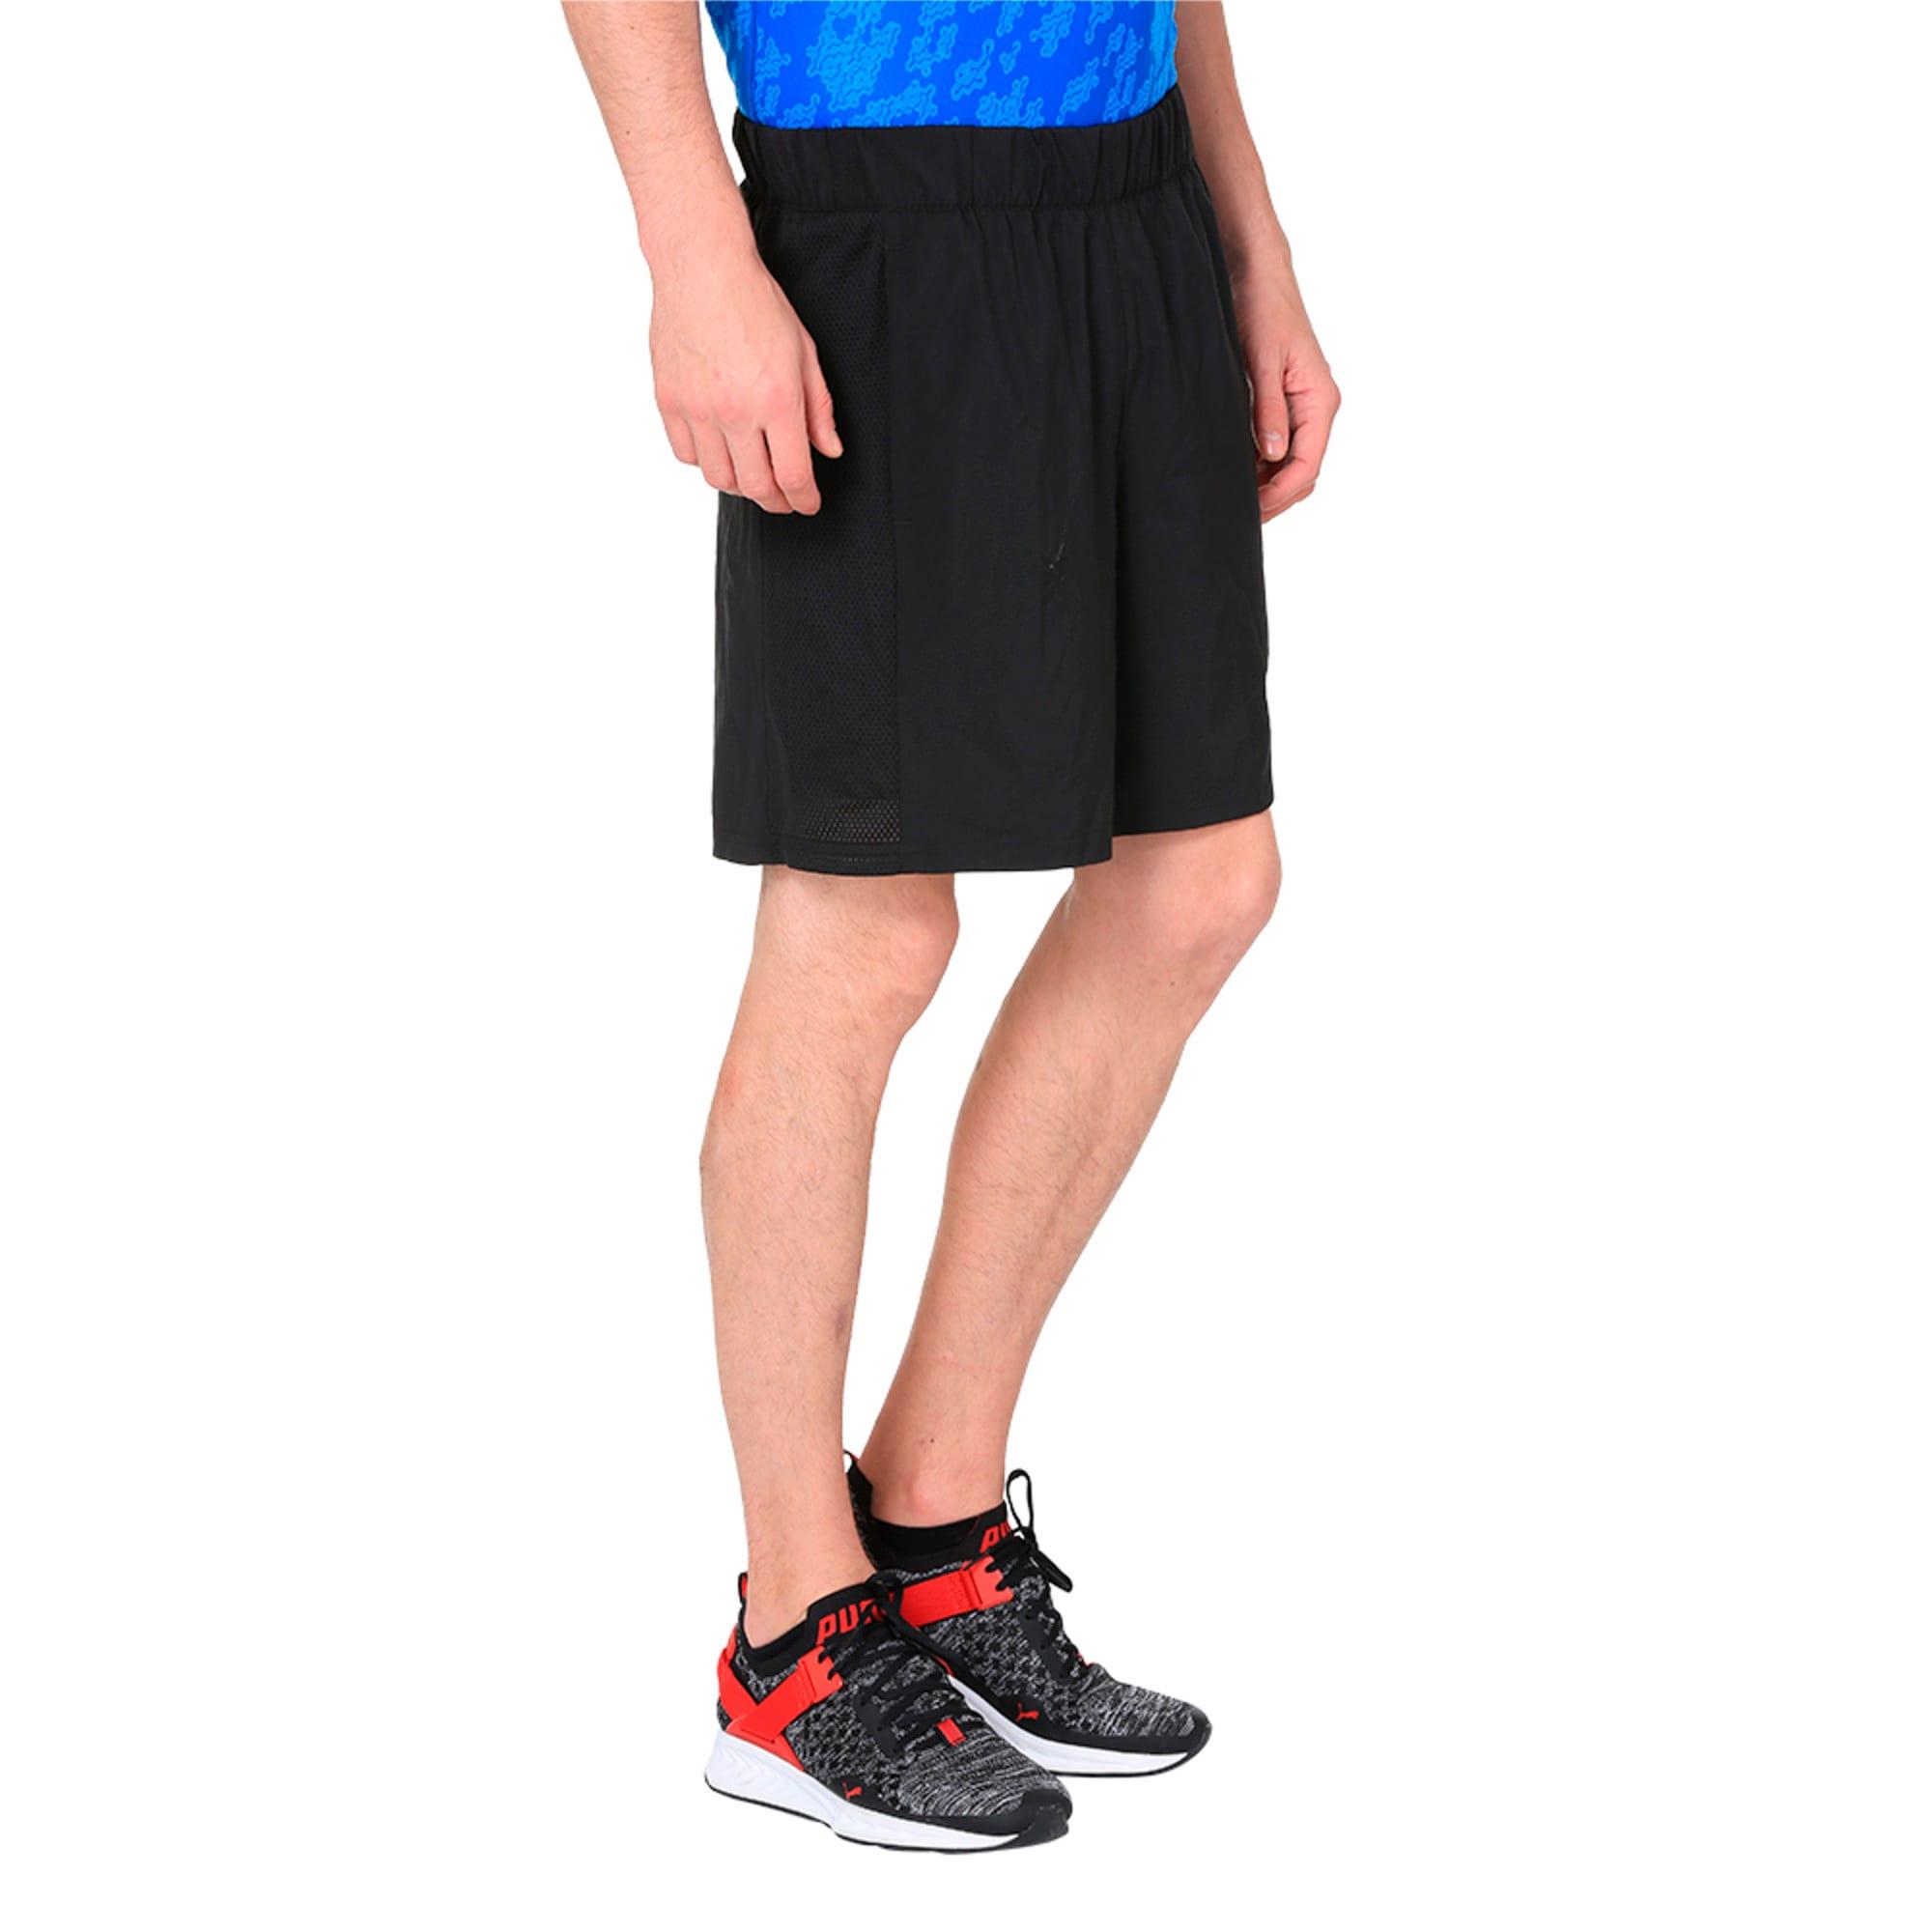 Thumbnail 5 of TECH Woven 2 in 1 Men's Training Shorts, Puma Black-Puma Black, medium-IND